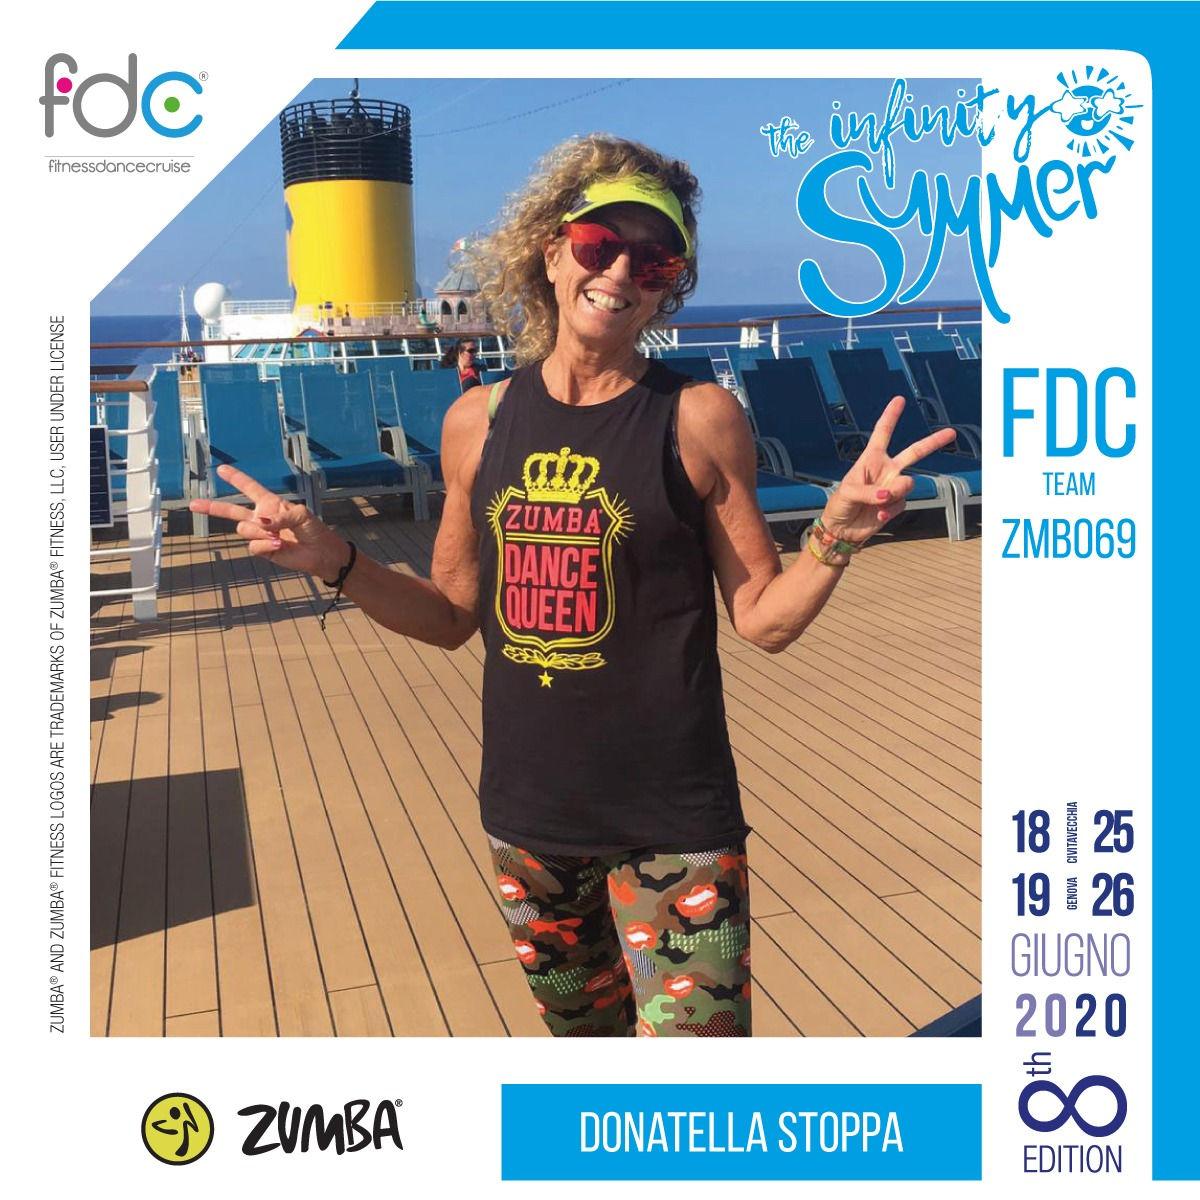 FDC Team Donatella Stoppa